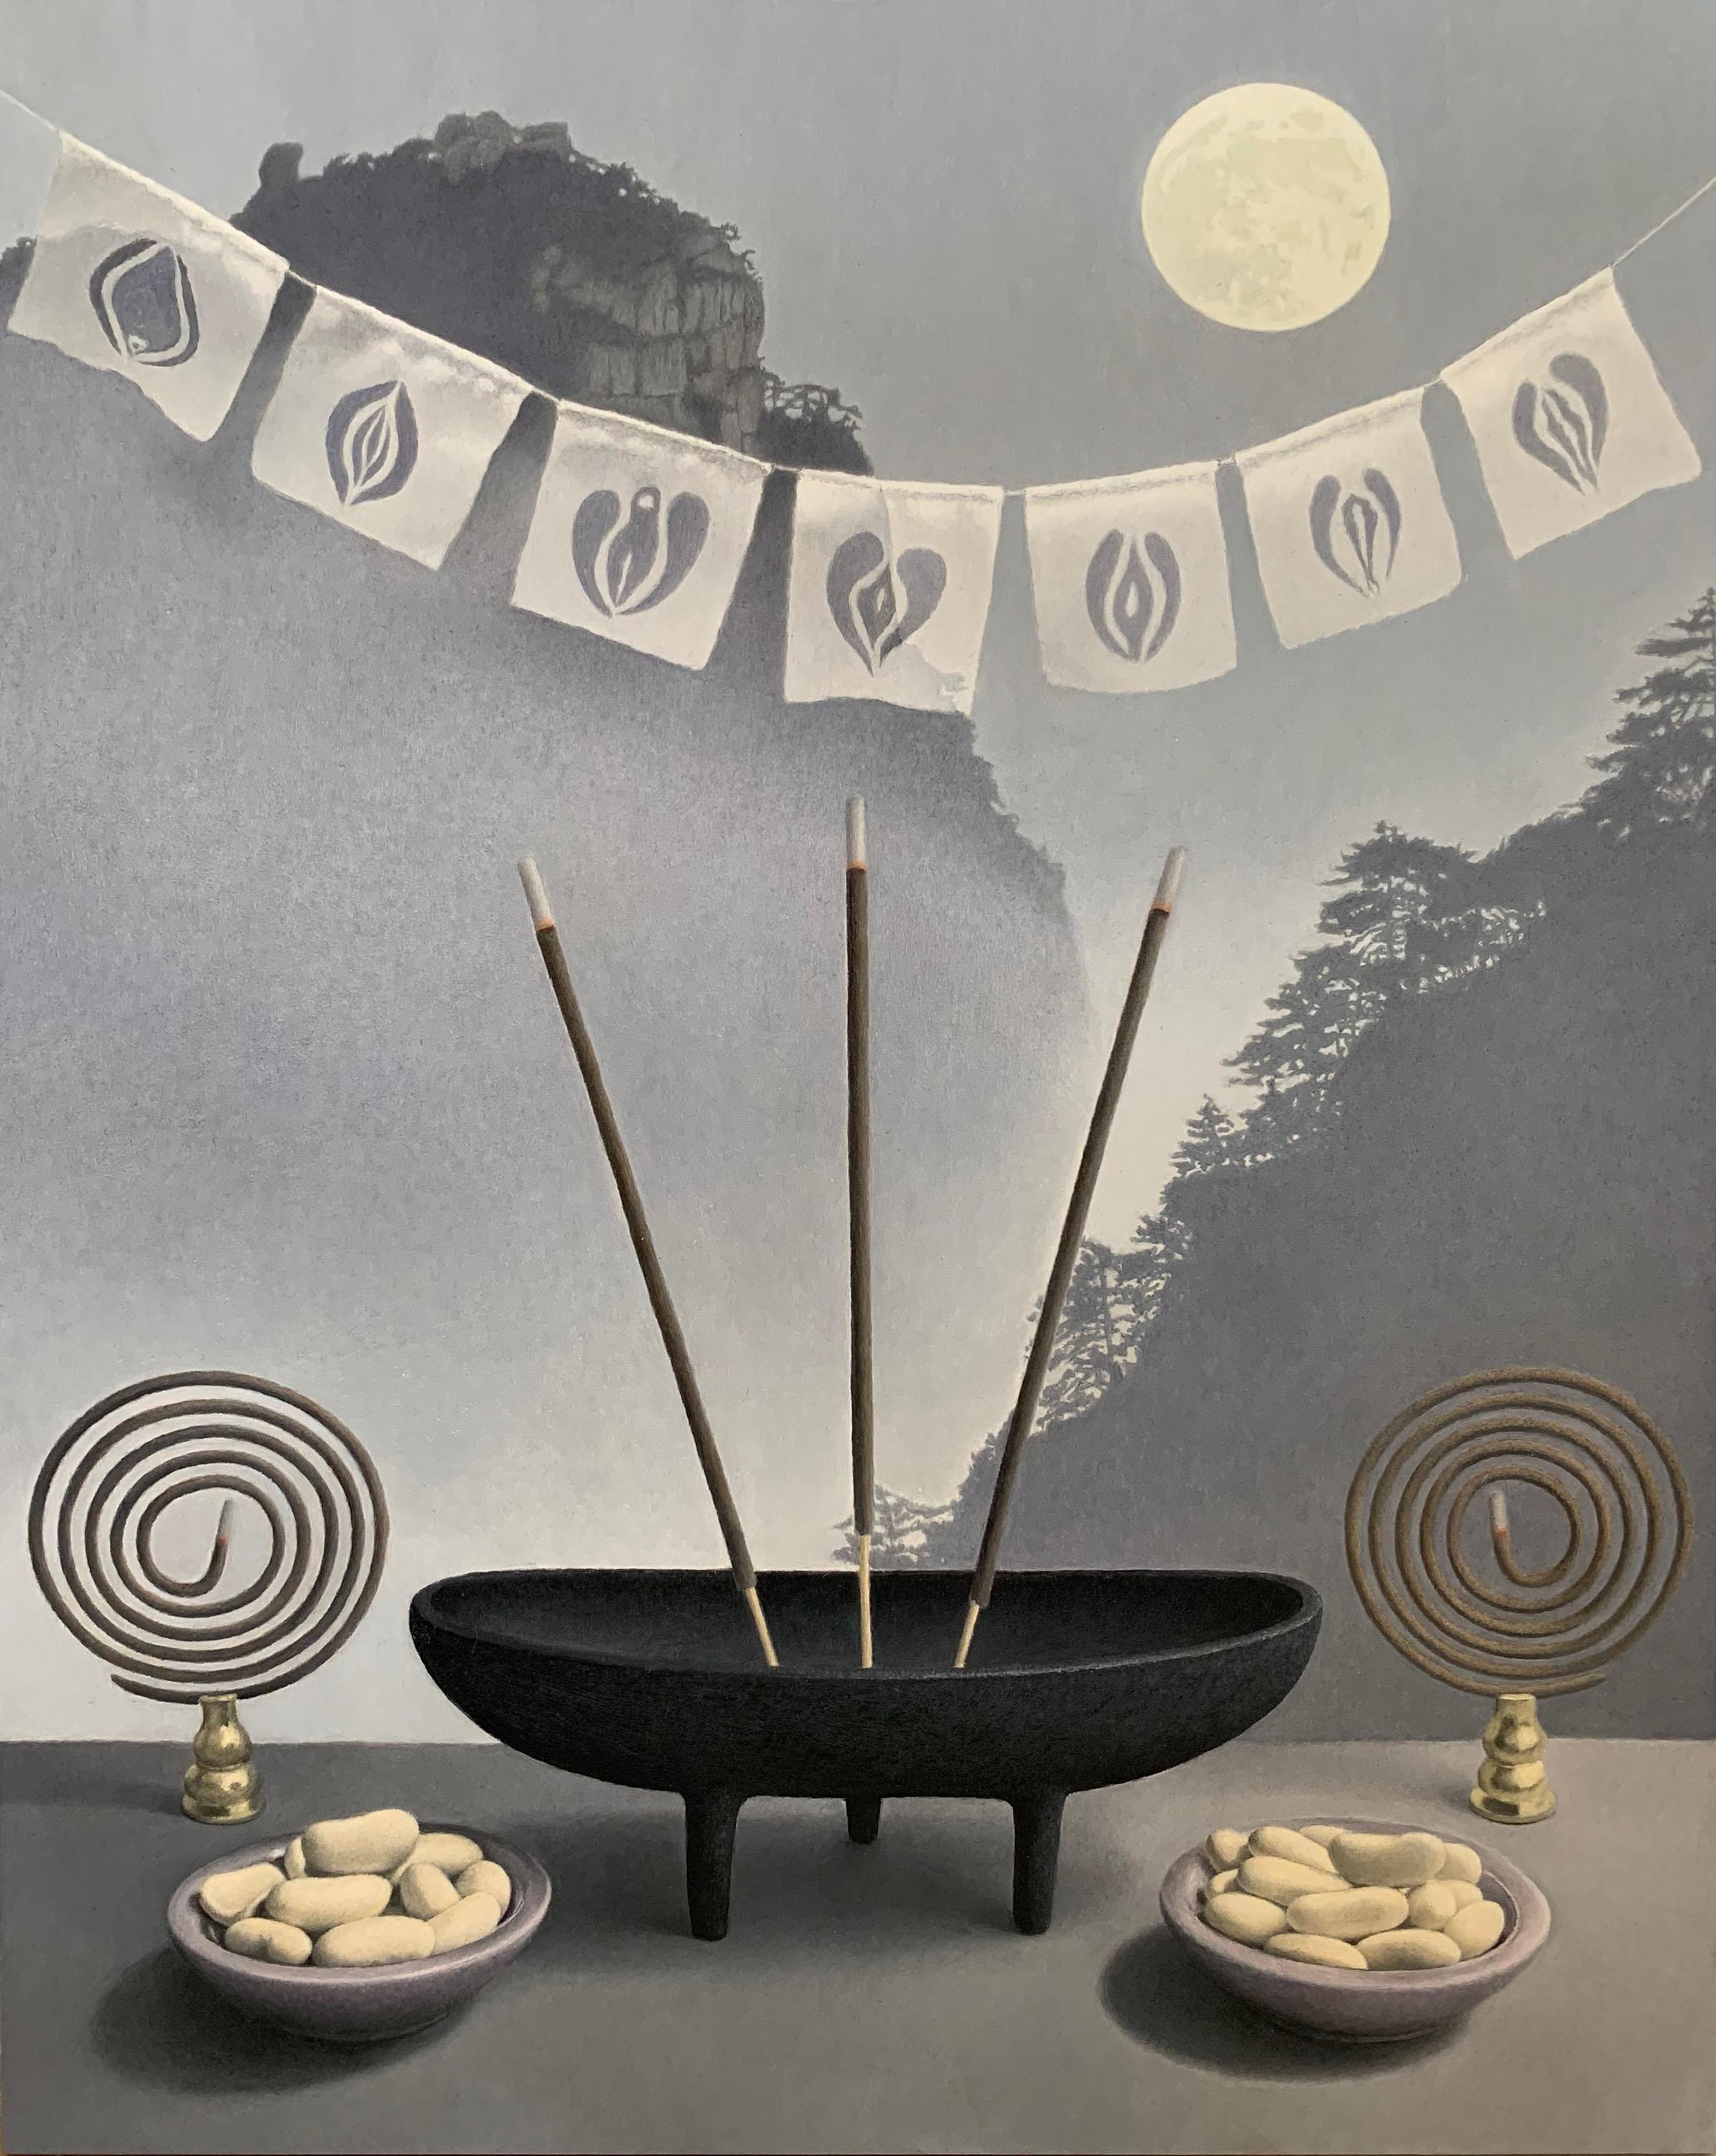 Meditation: Pilgrimage